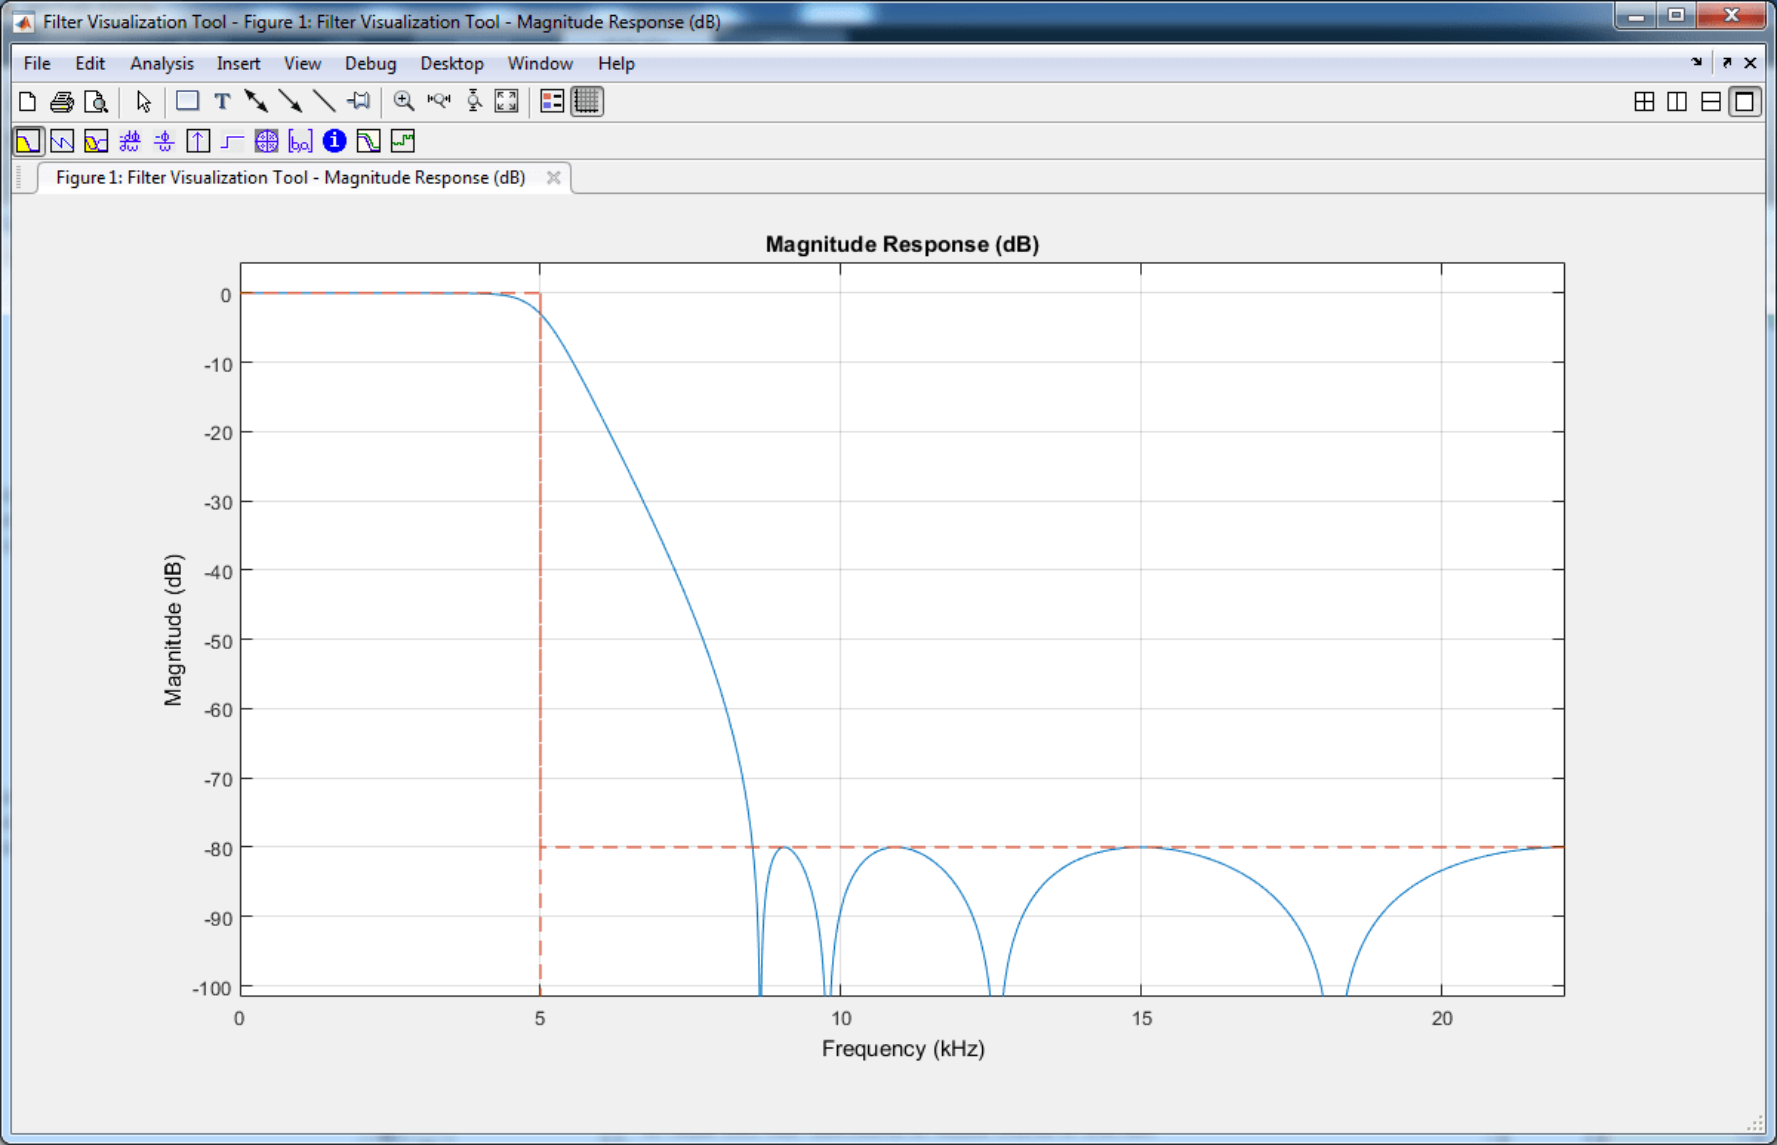 Lowpass IIR Filter Design in Simulink - MATLAB & Simulink